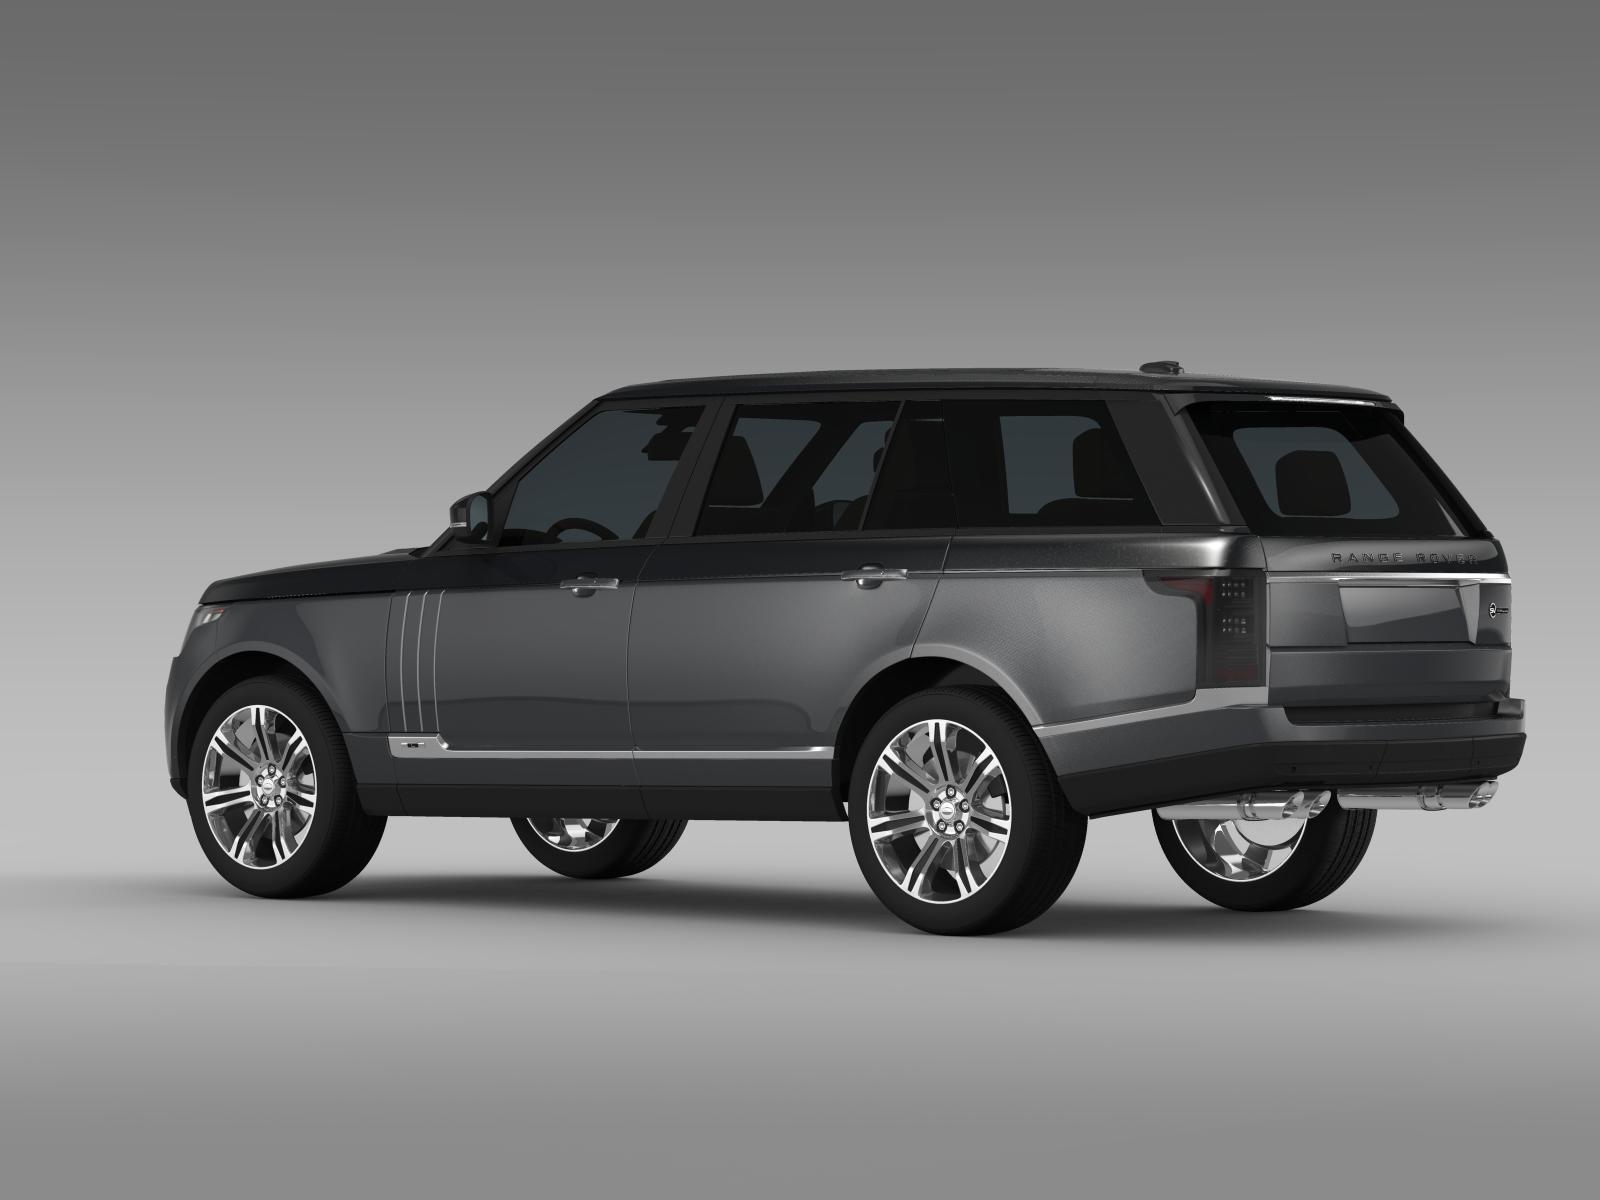 range rover svautobiography l405 2016 3d model buy range rover svautobiography l405 2016 3d. Black Bedroom Furniture Sets. Home Design Ideas